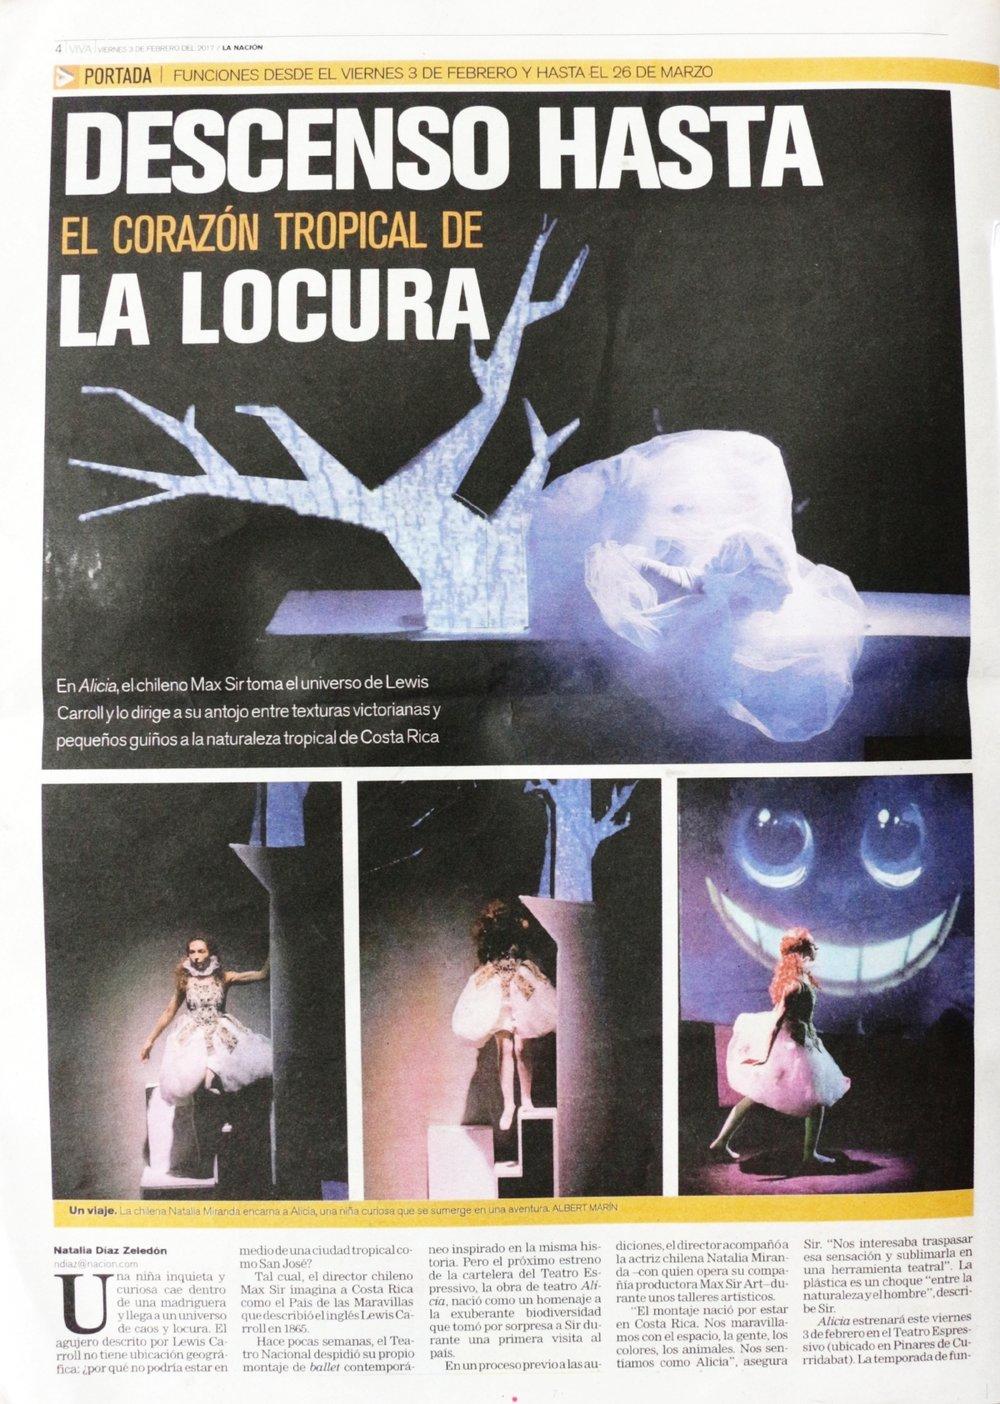 http://www.nacion.com/ocio/teatro/Alicia-desciende-tropical-Lewis-Carroll_0_1613638630.html